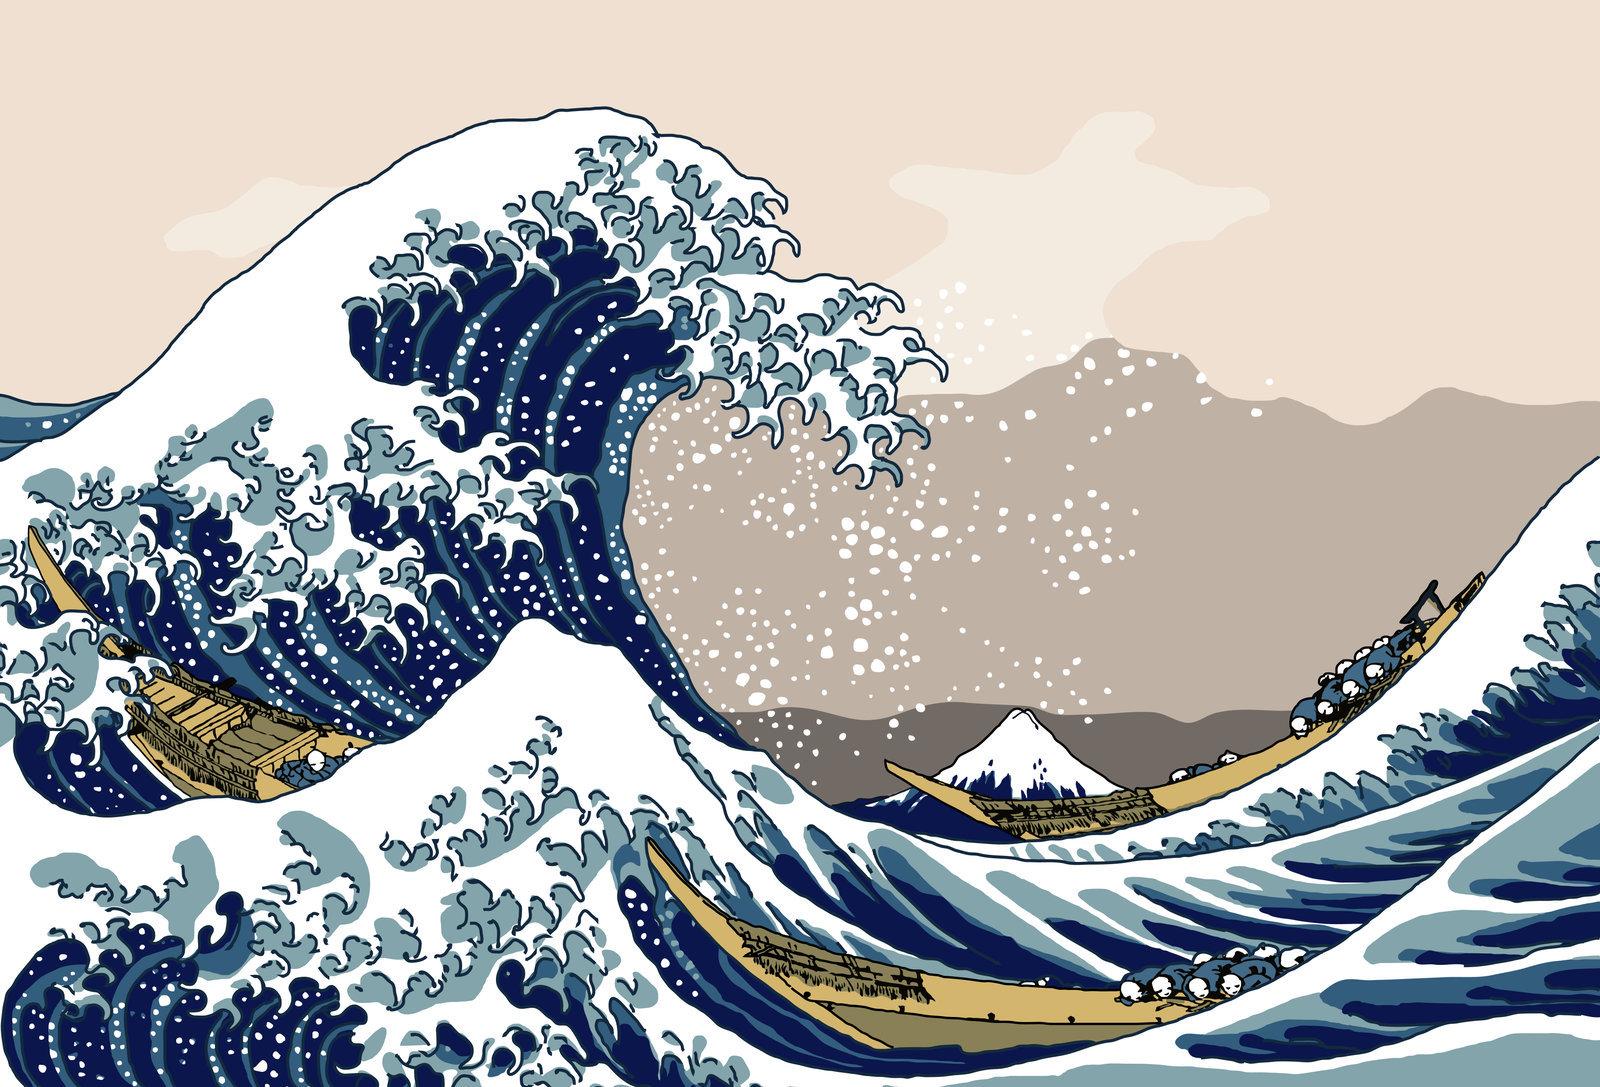 hokusai1 by refuse11 1600x1087